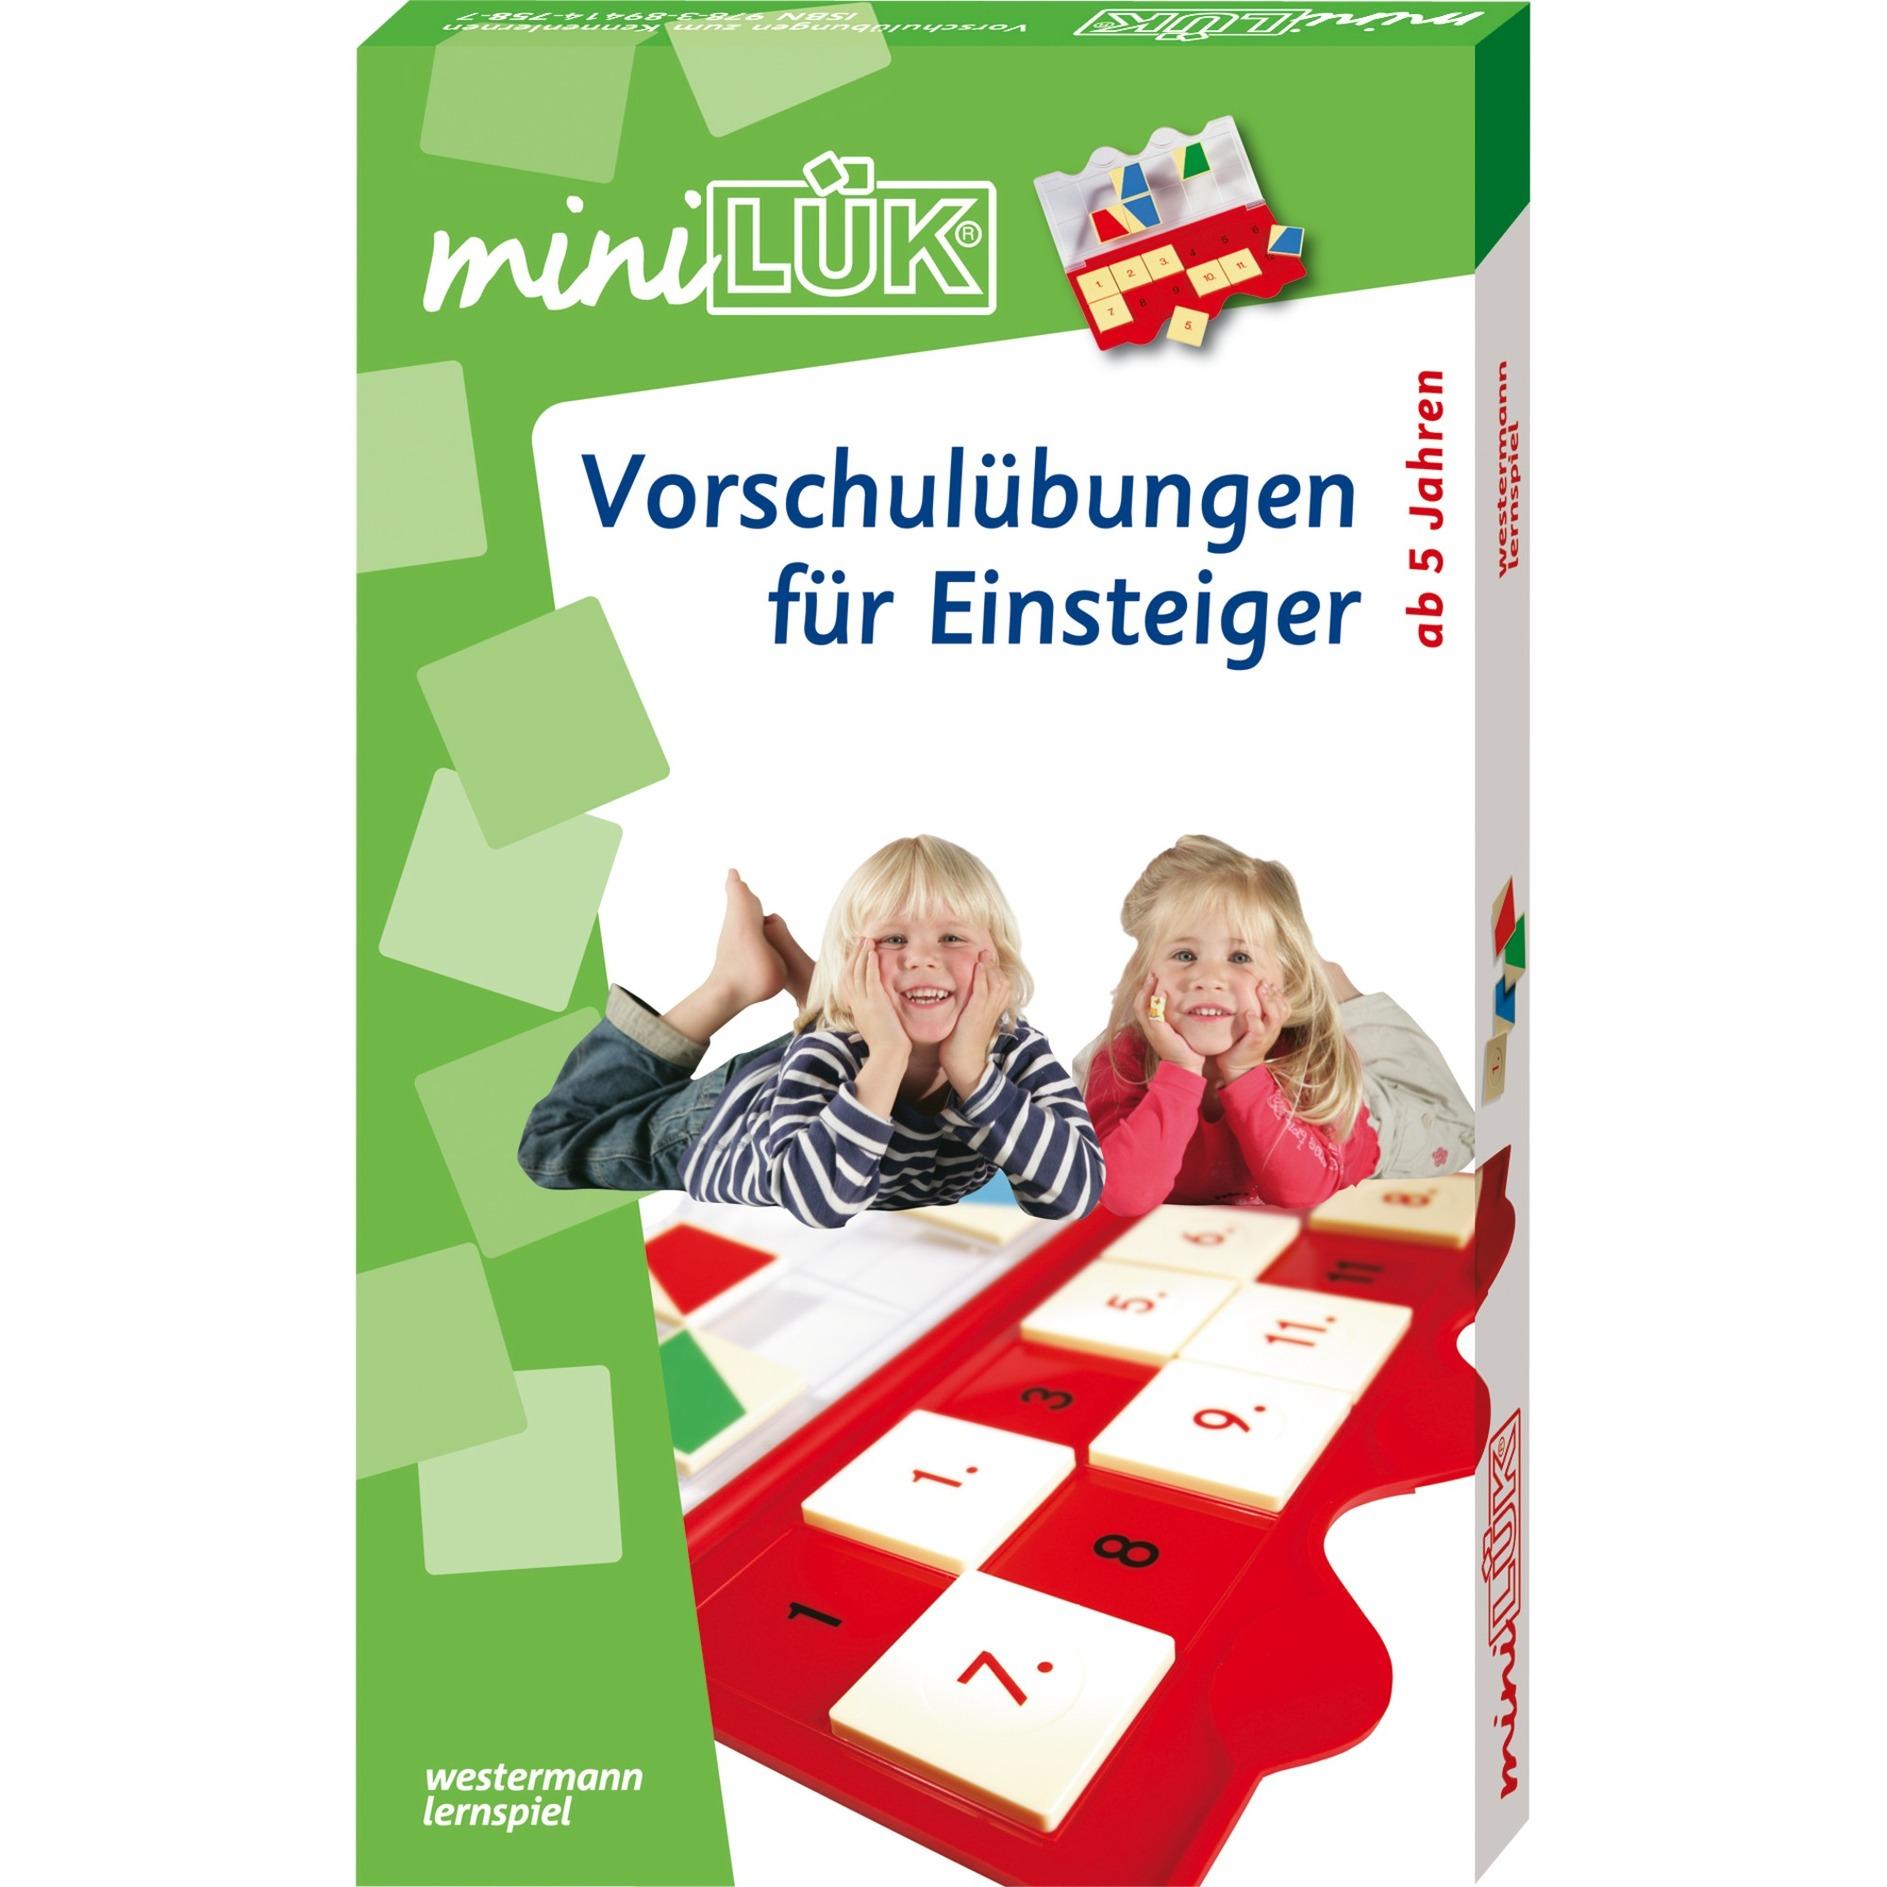 mini-Set Vorschulübungen für Einsteiger livre pour enfants, Manuel